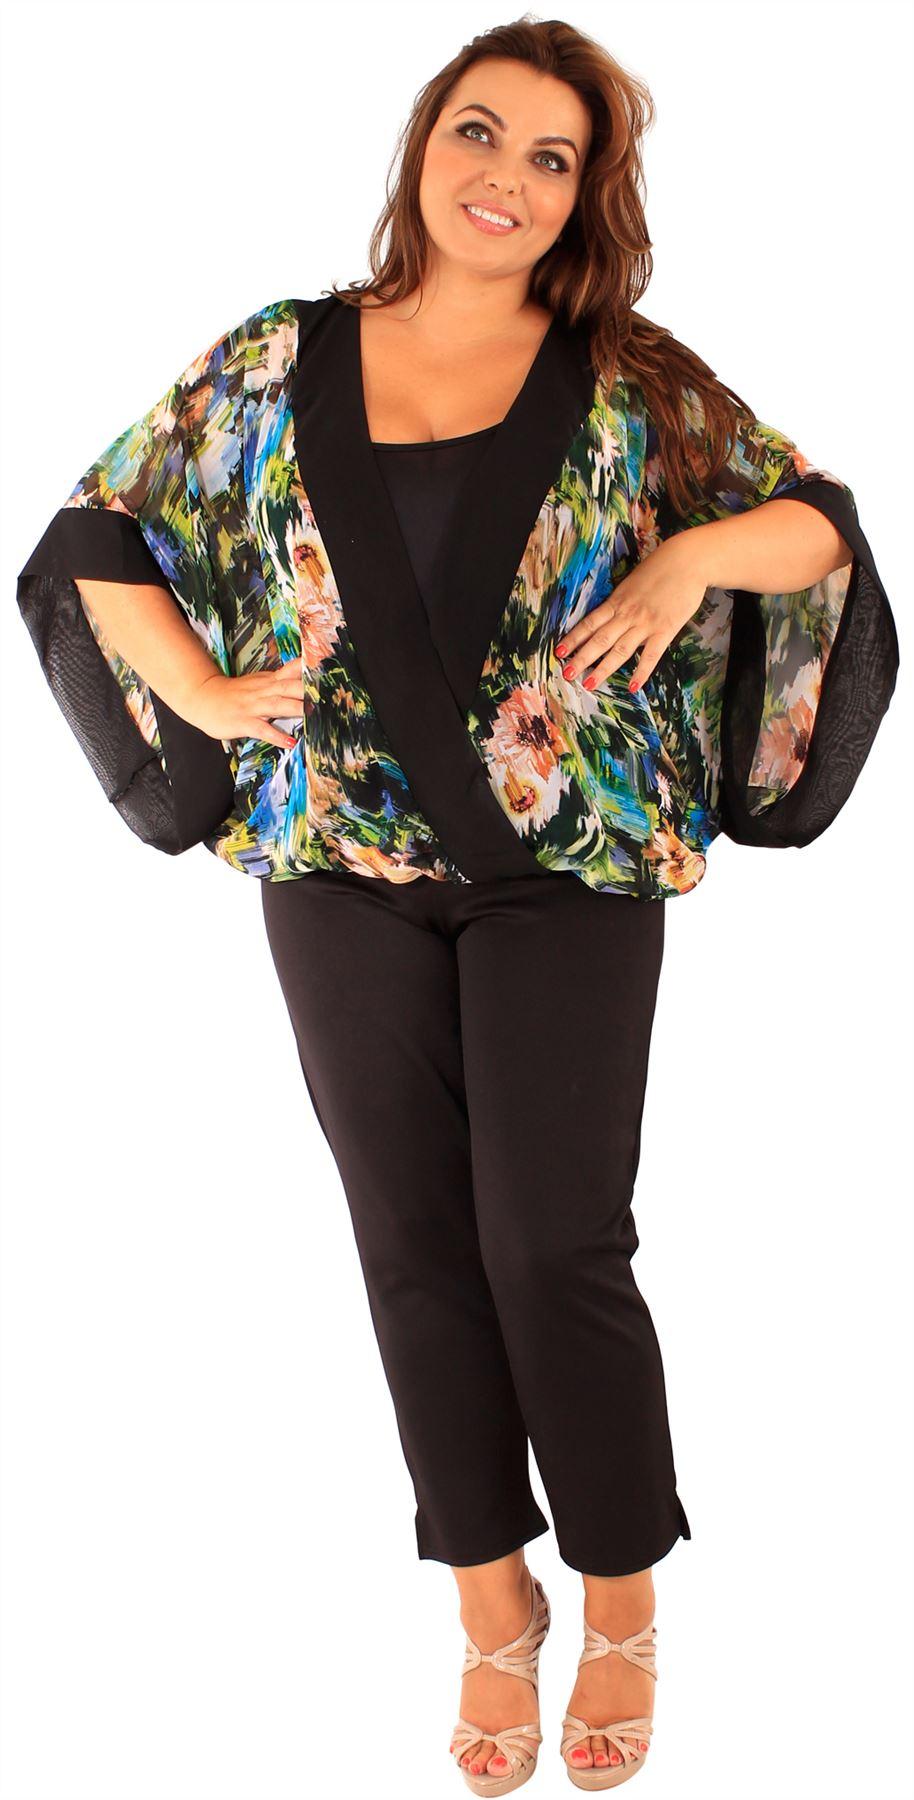 Women's Boho Floral Print Kimono Cardigan Autumn Plus Size Cotton Tops $ 12 out of 5 stars 8. Wiwish. Women's Floral Print Sheer Chiffon Loose Kimono Cardigan Blouse Top $ 13 99 Prime. 5 out of 5 stars 2. Sumen. Women Floral Kimono Cover up Loose Chiffon Blouse Open Front Cardigan $ 4